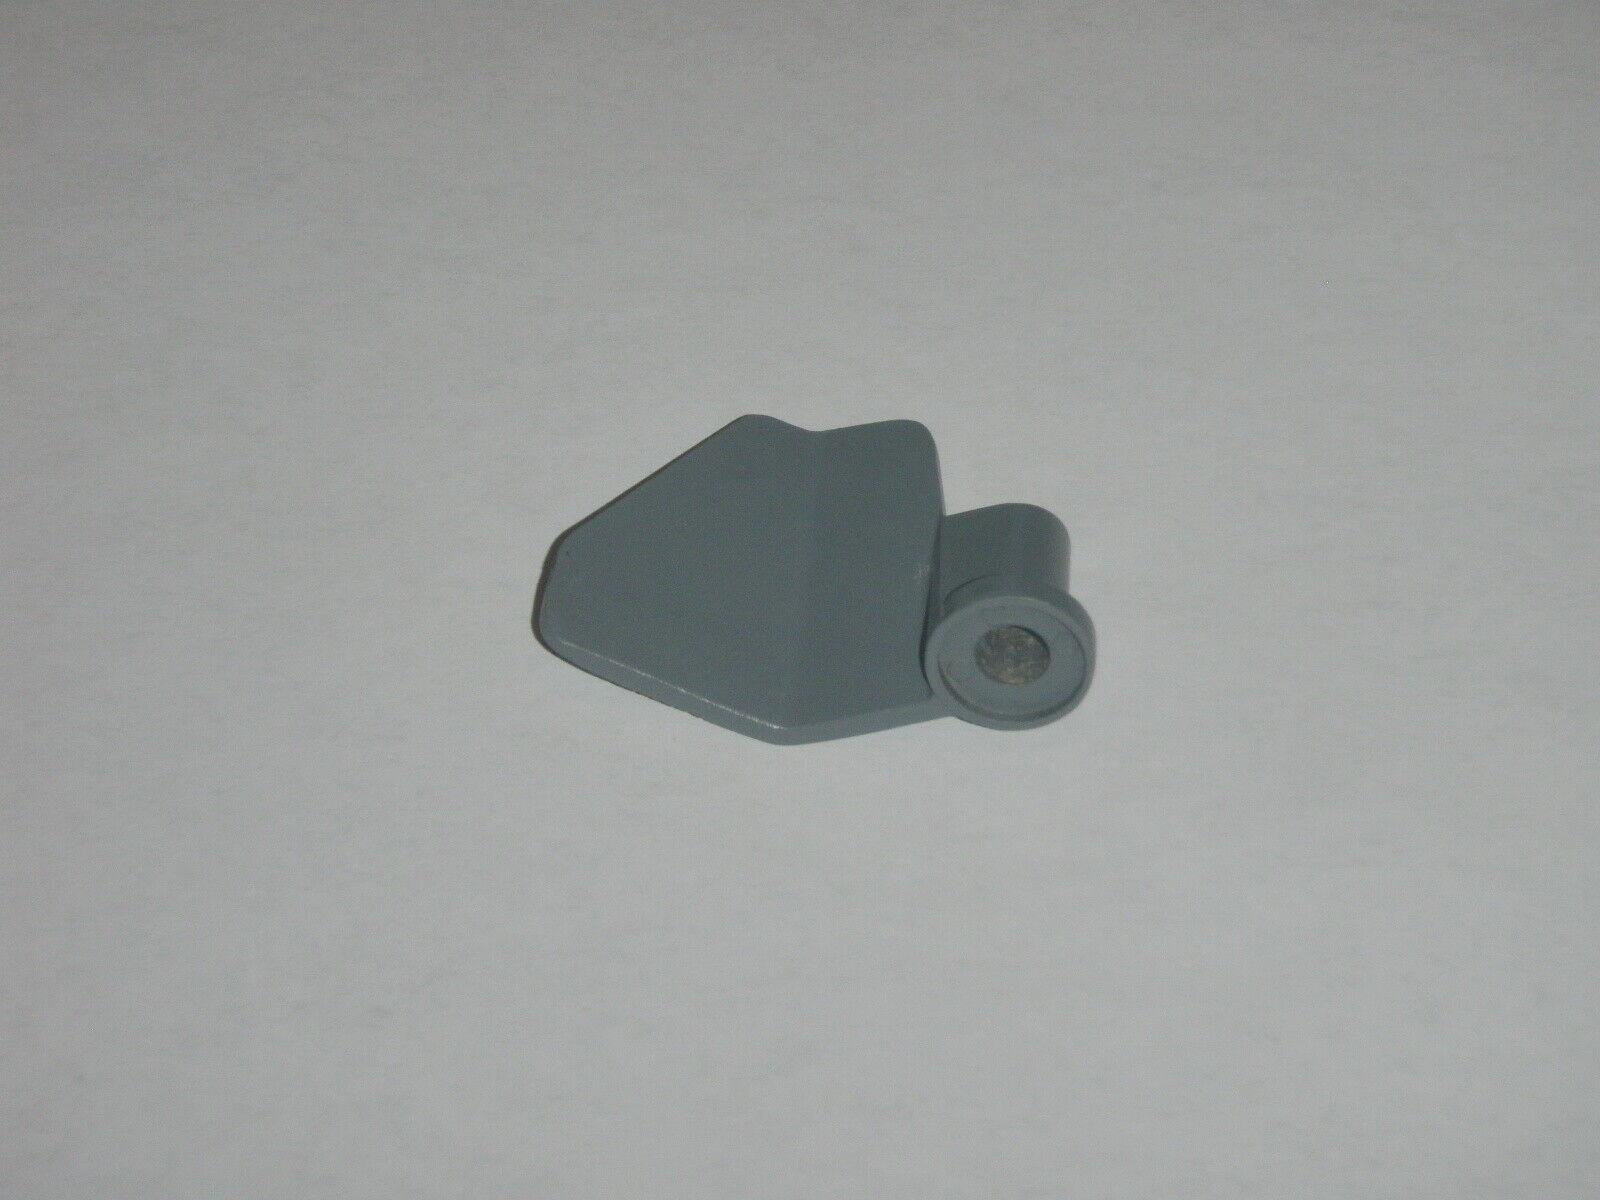 Farberware Bread Maker Machine Original Paddle for Models FTR700 (OEM) FTR700DL image 9